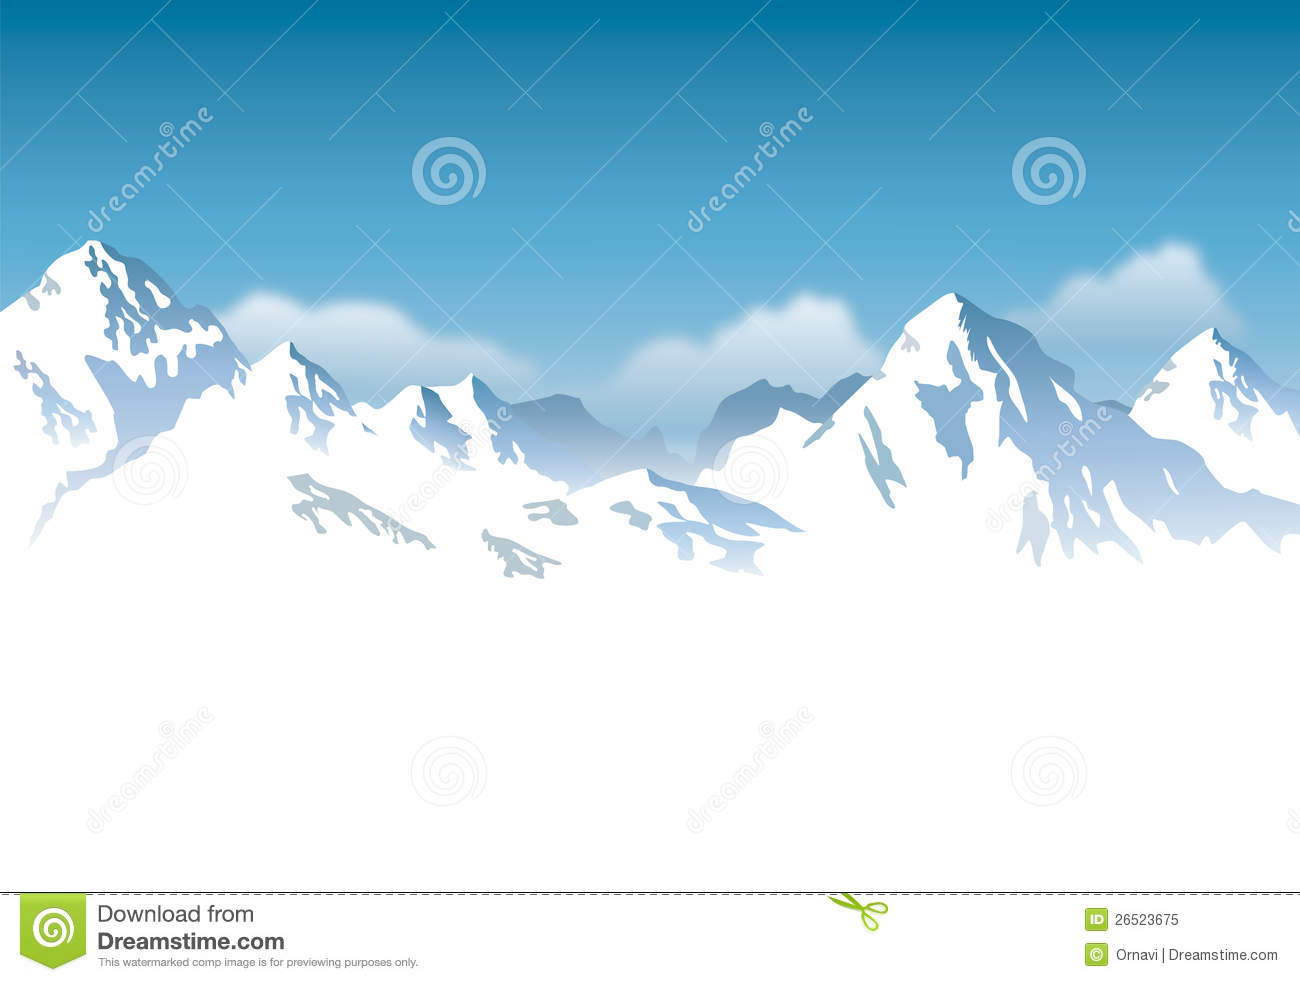 Himalaya clipart mountain sketch Mountans Himalaya Download #7 clipart